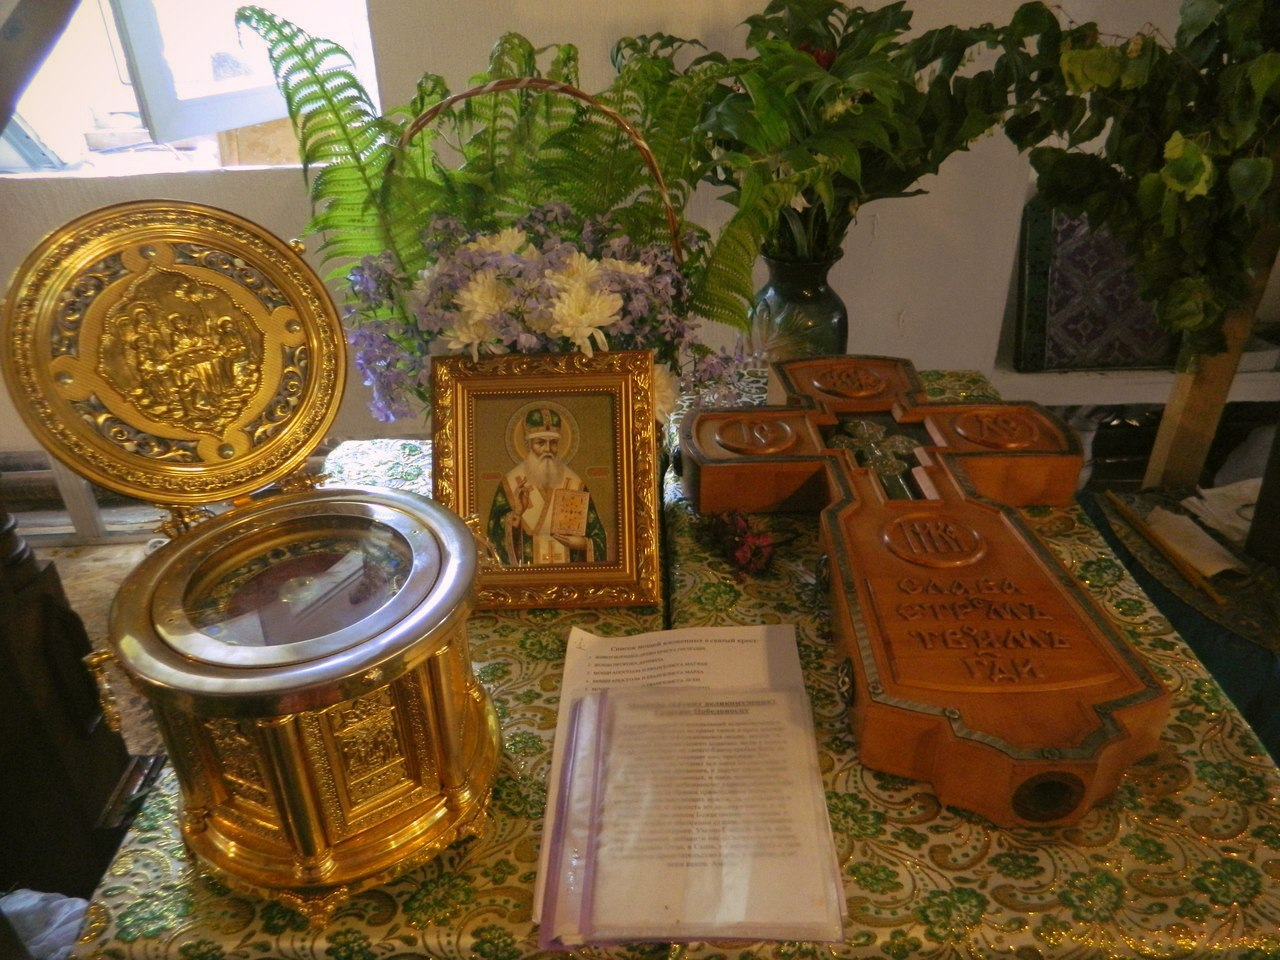 Ковчег с частицей мощей Луки Войно-Ясенецкого и Крест реликварий XVII века